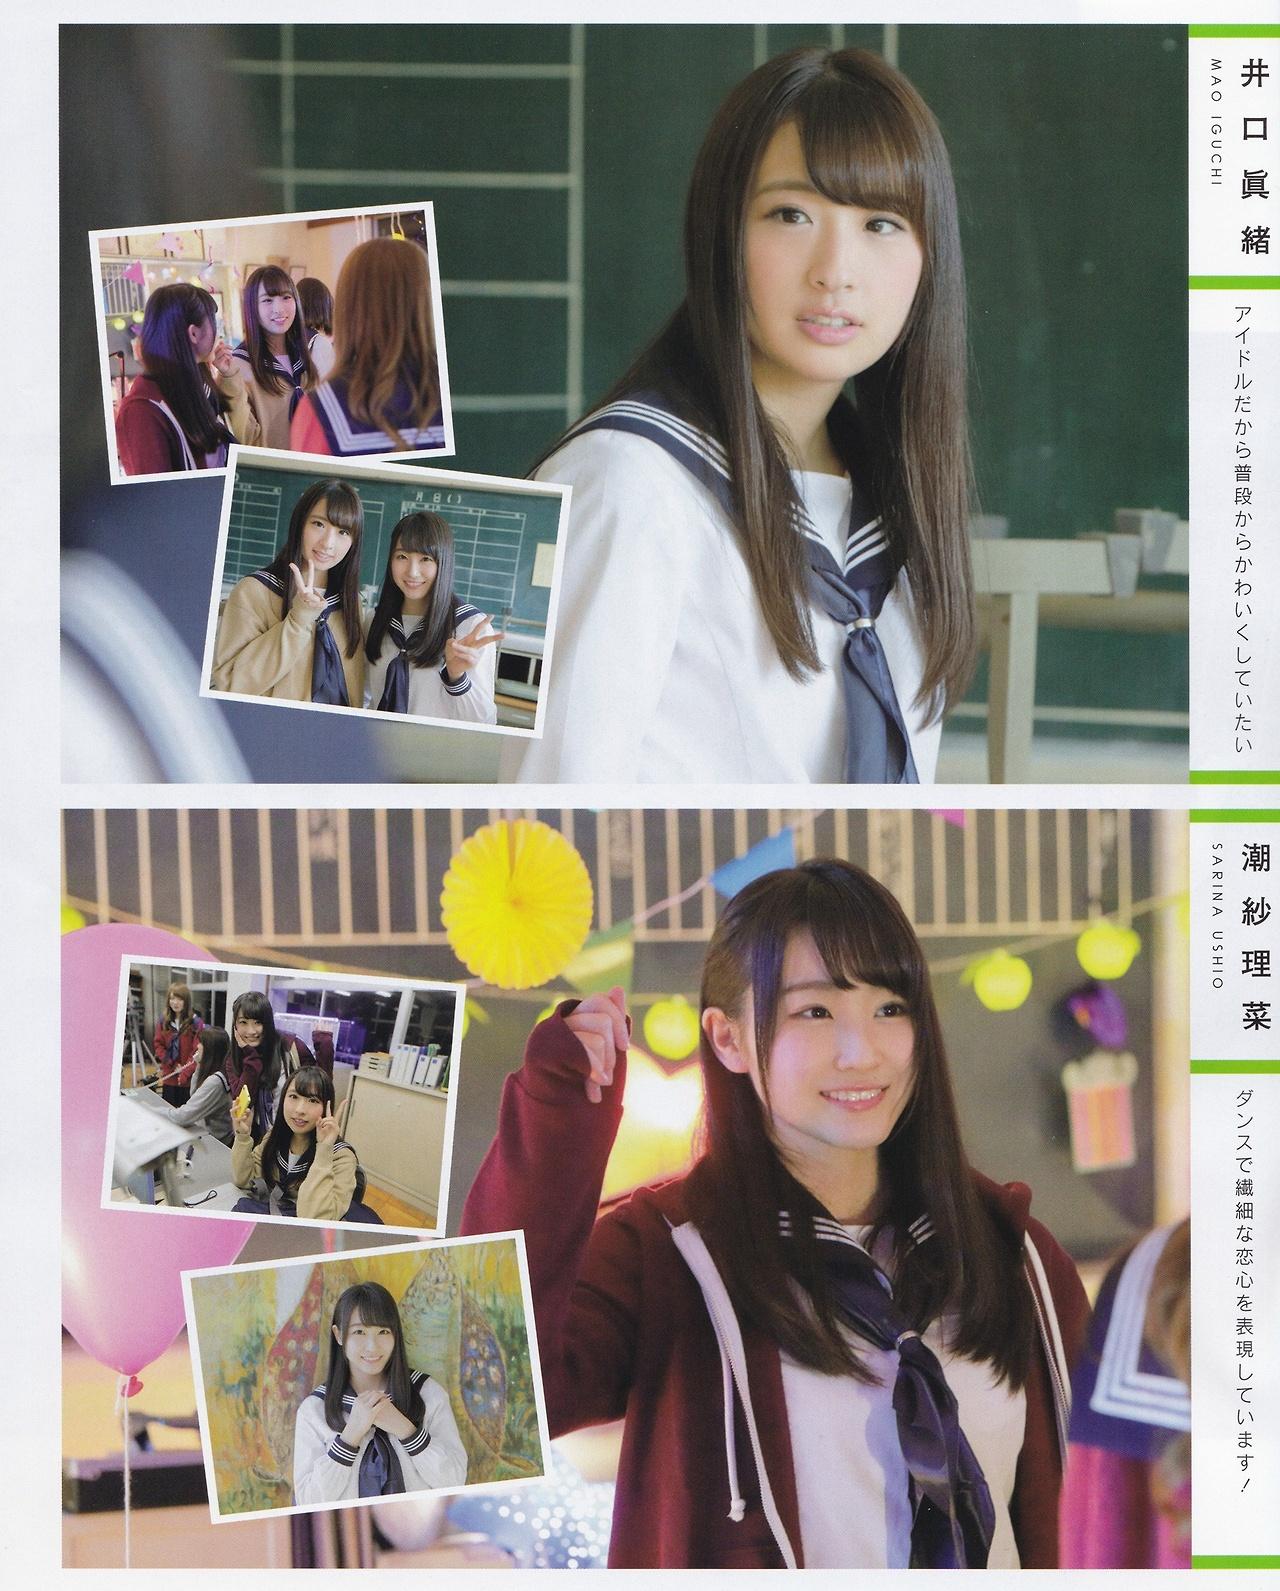 Hiragana Keyakizaka46, UTB+ 2017.05 Vol.37 (アップトゥボーイ プラス 2017年35号)